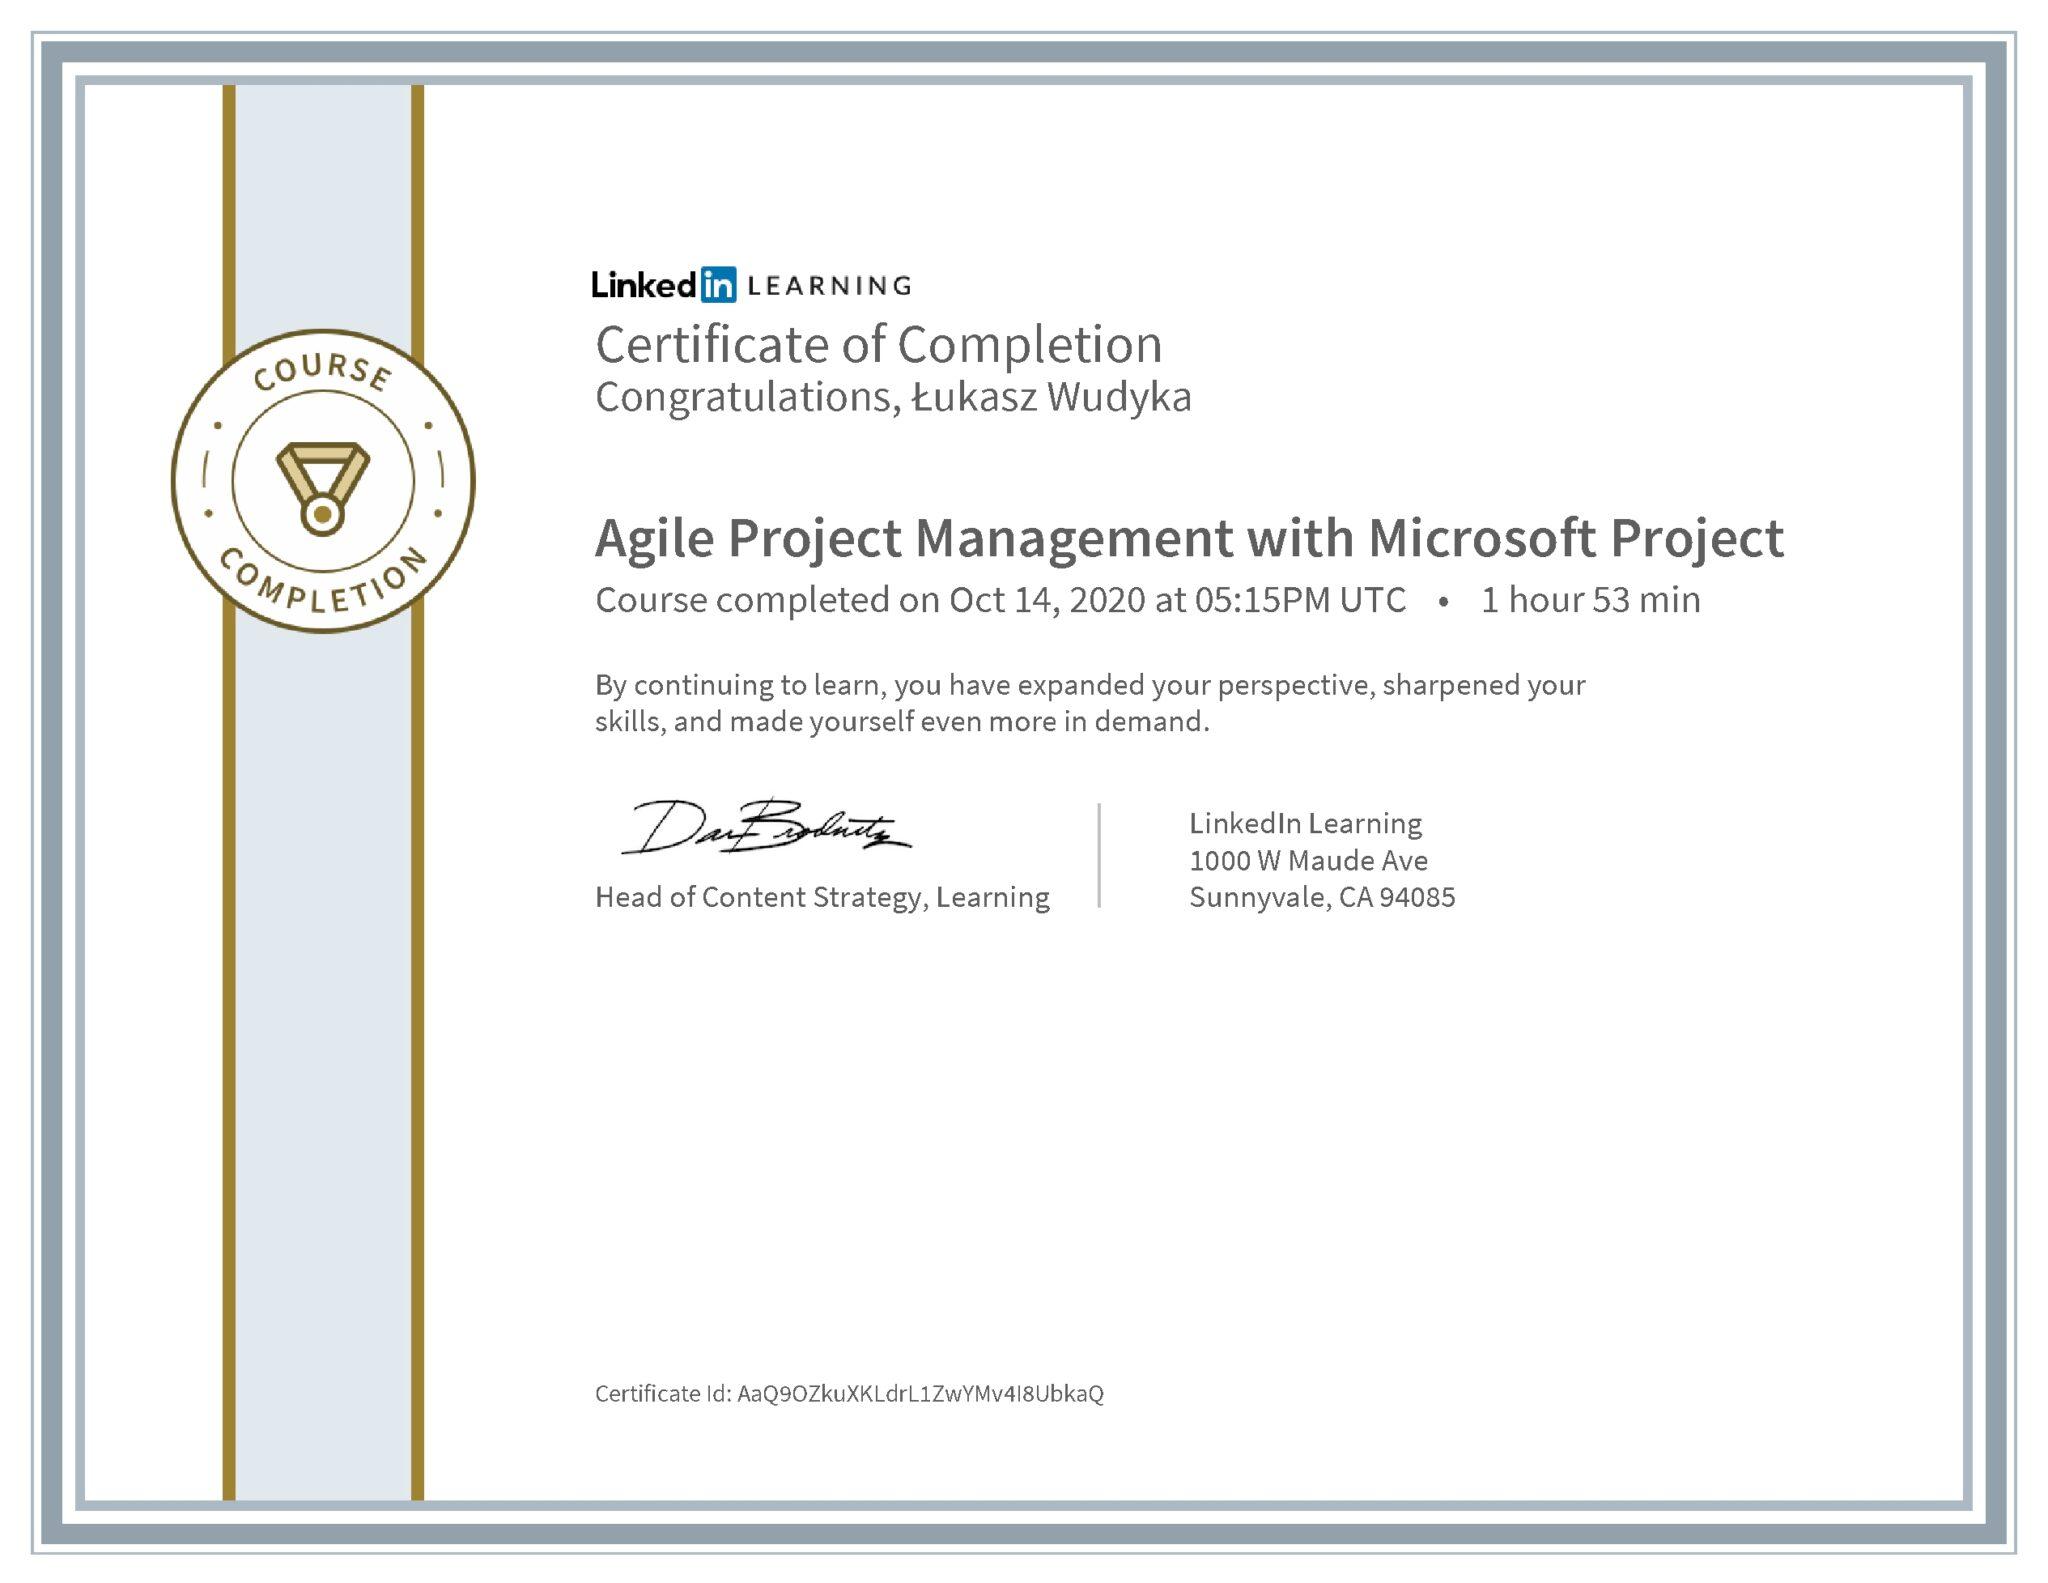 Łukasz Wudyka certyfikat LinkedIn Agile Project Management with Microsoft Project